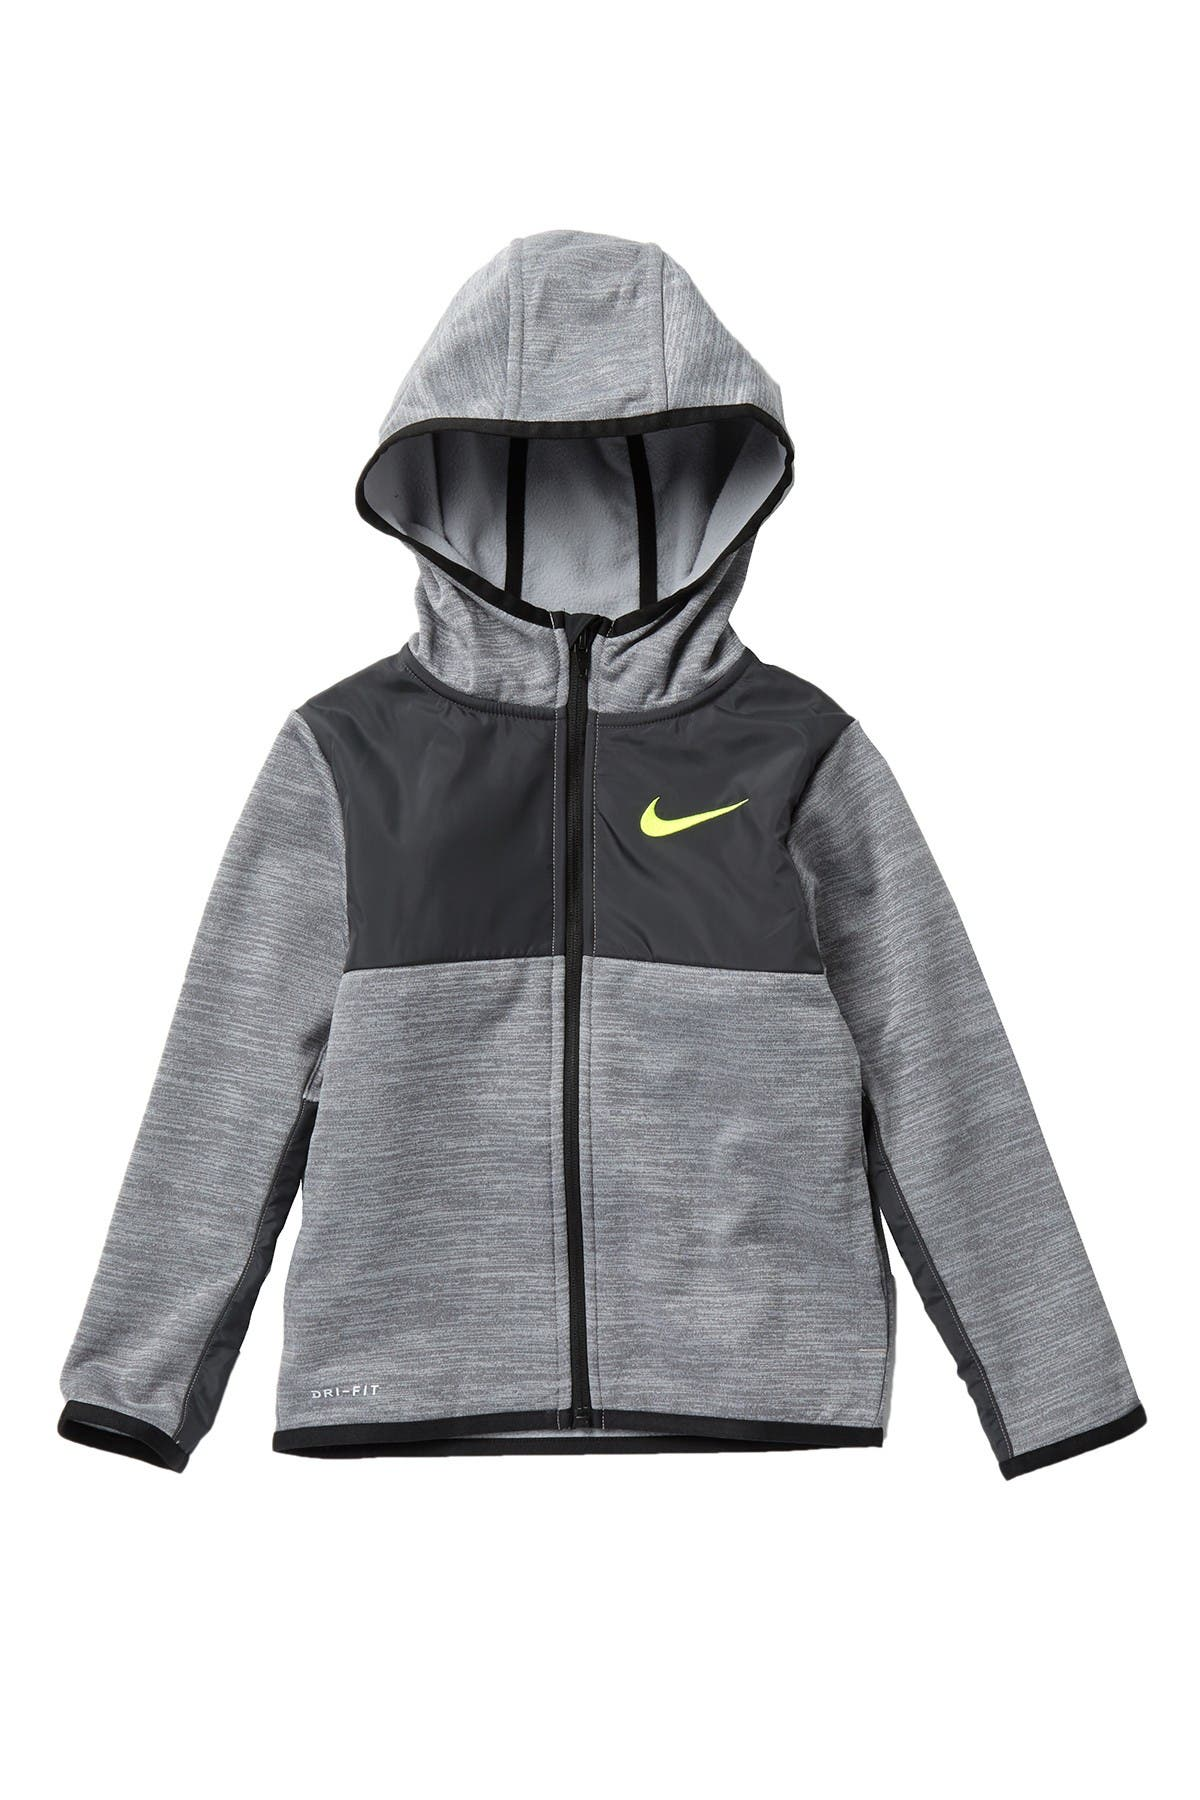 Image of Nike Winterized Therma Hoodie